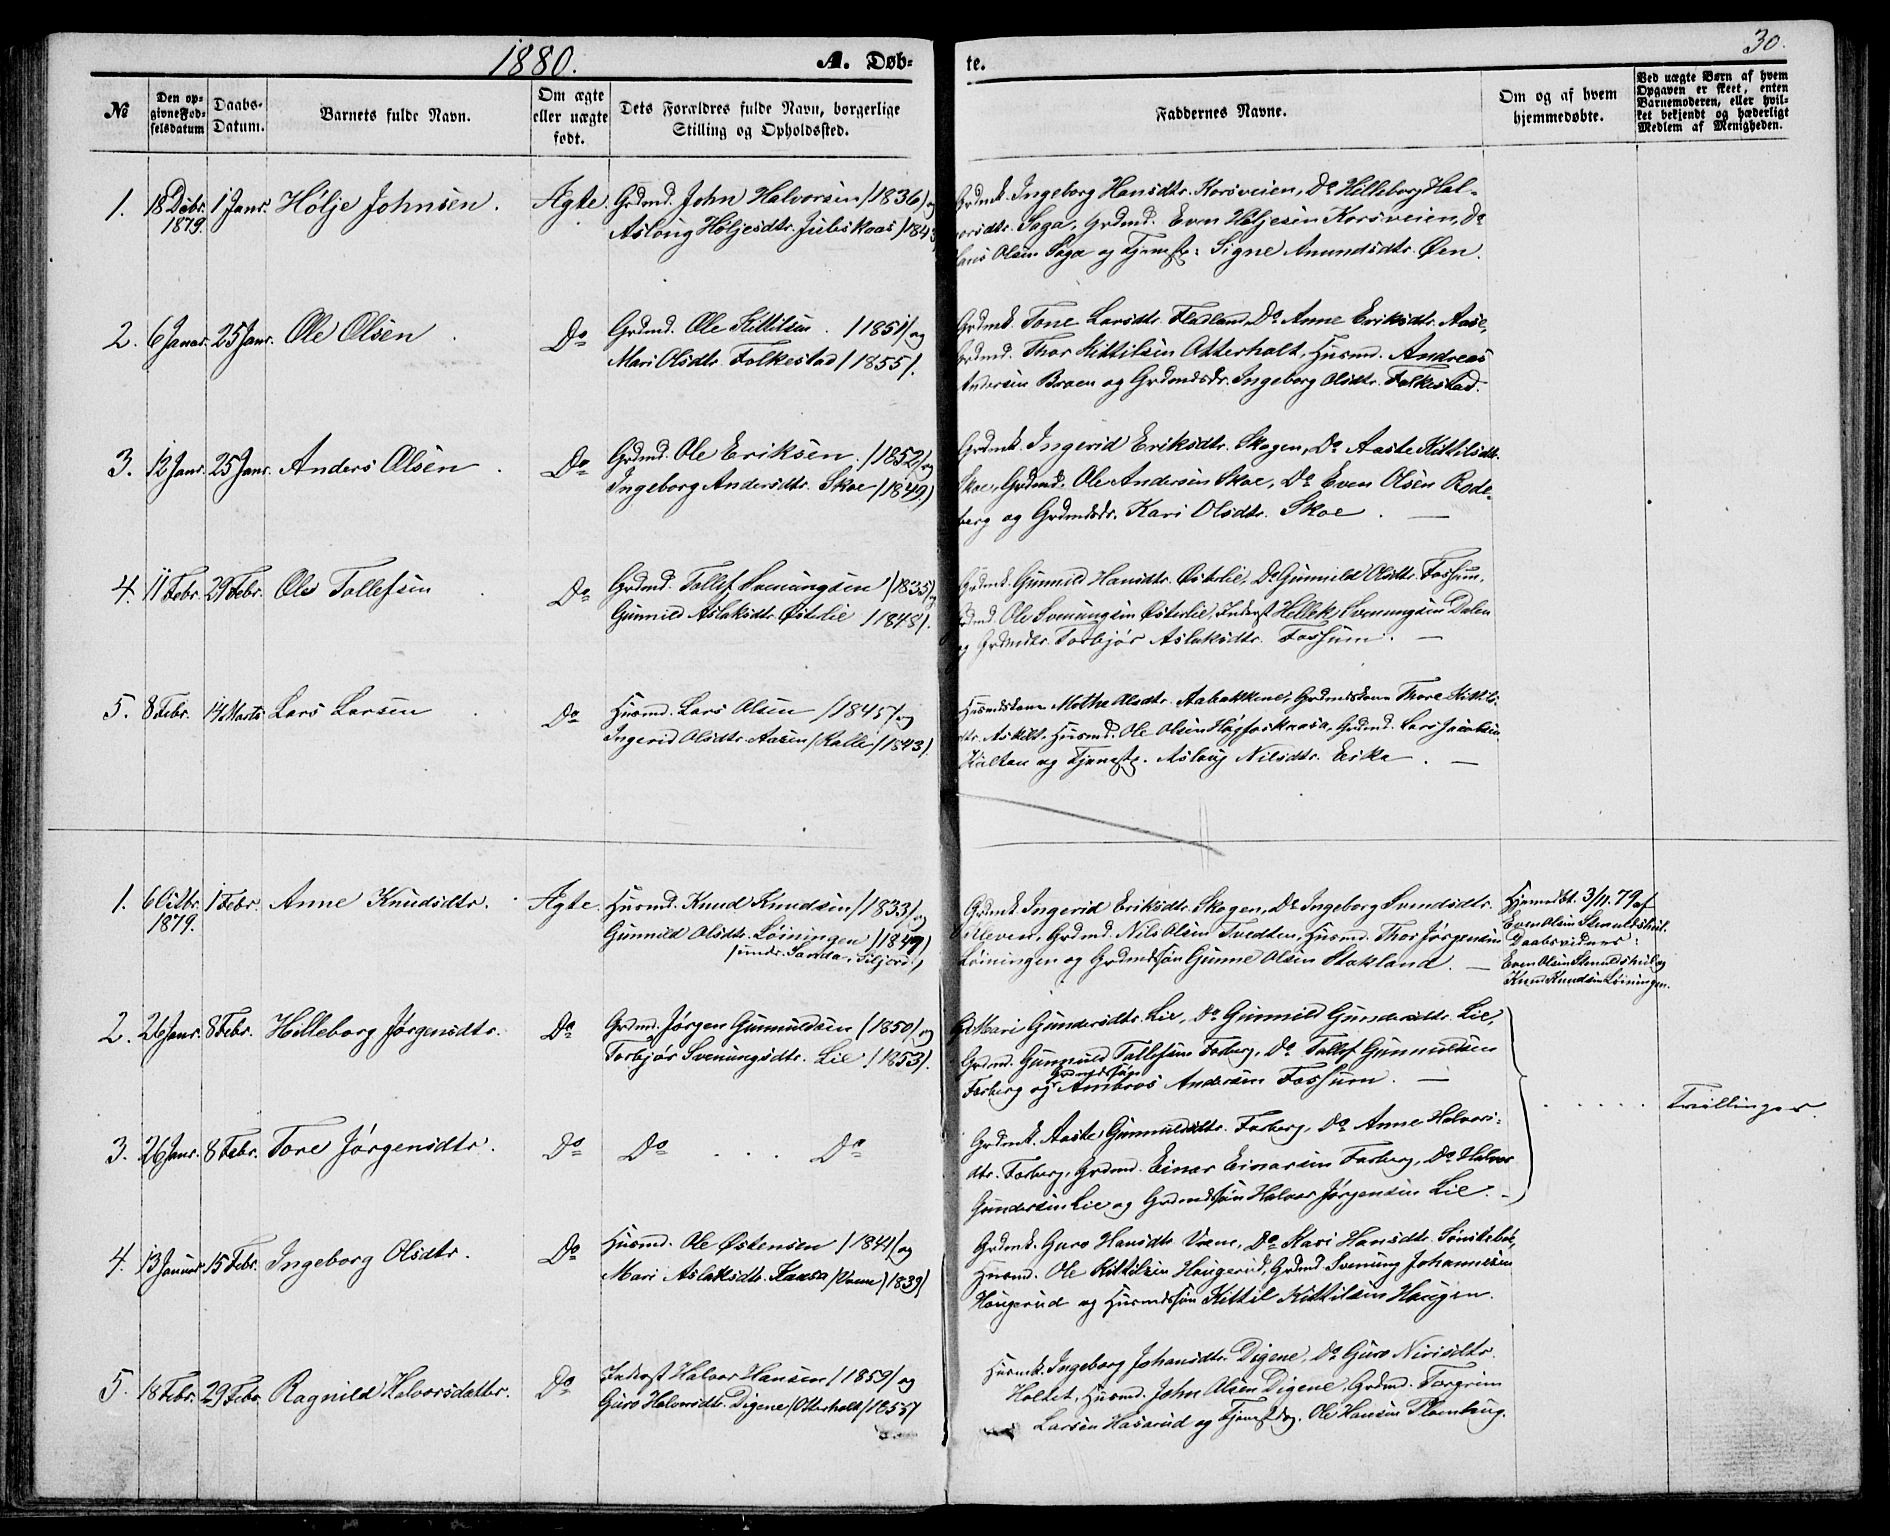 SAKO, Bø kirkebøker, G/Ga/L0004: Klokkerbok nr. 4, 1876-1882, s. 30